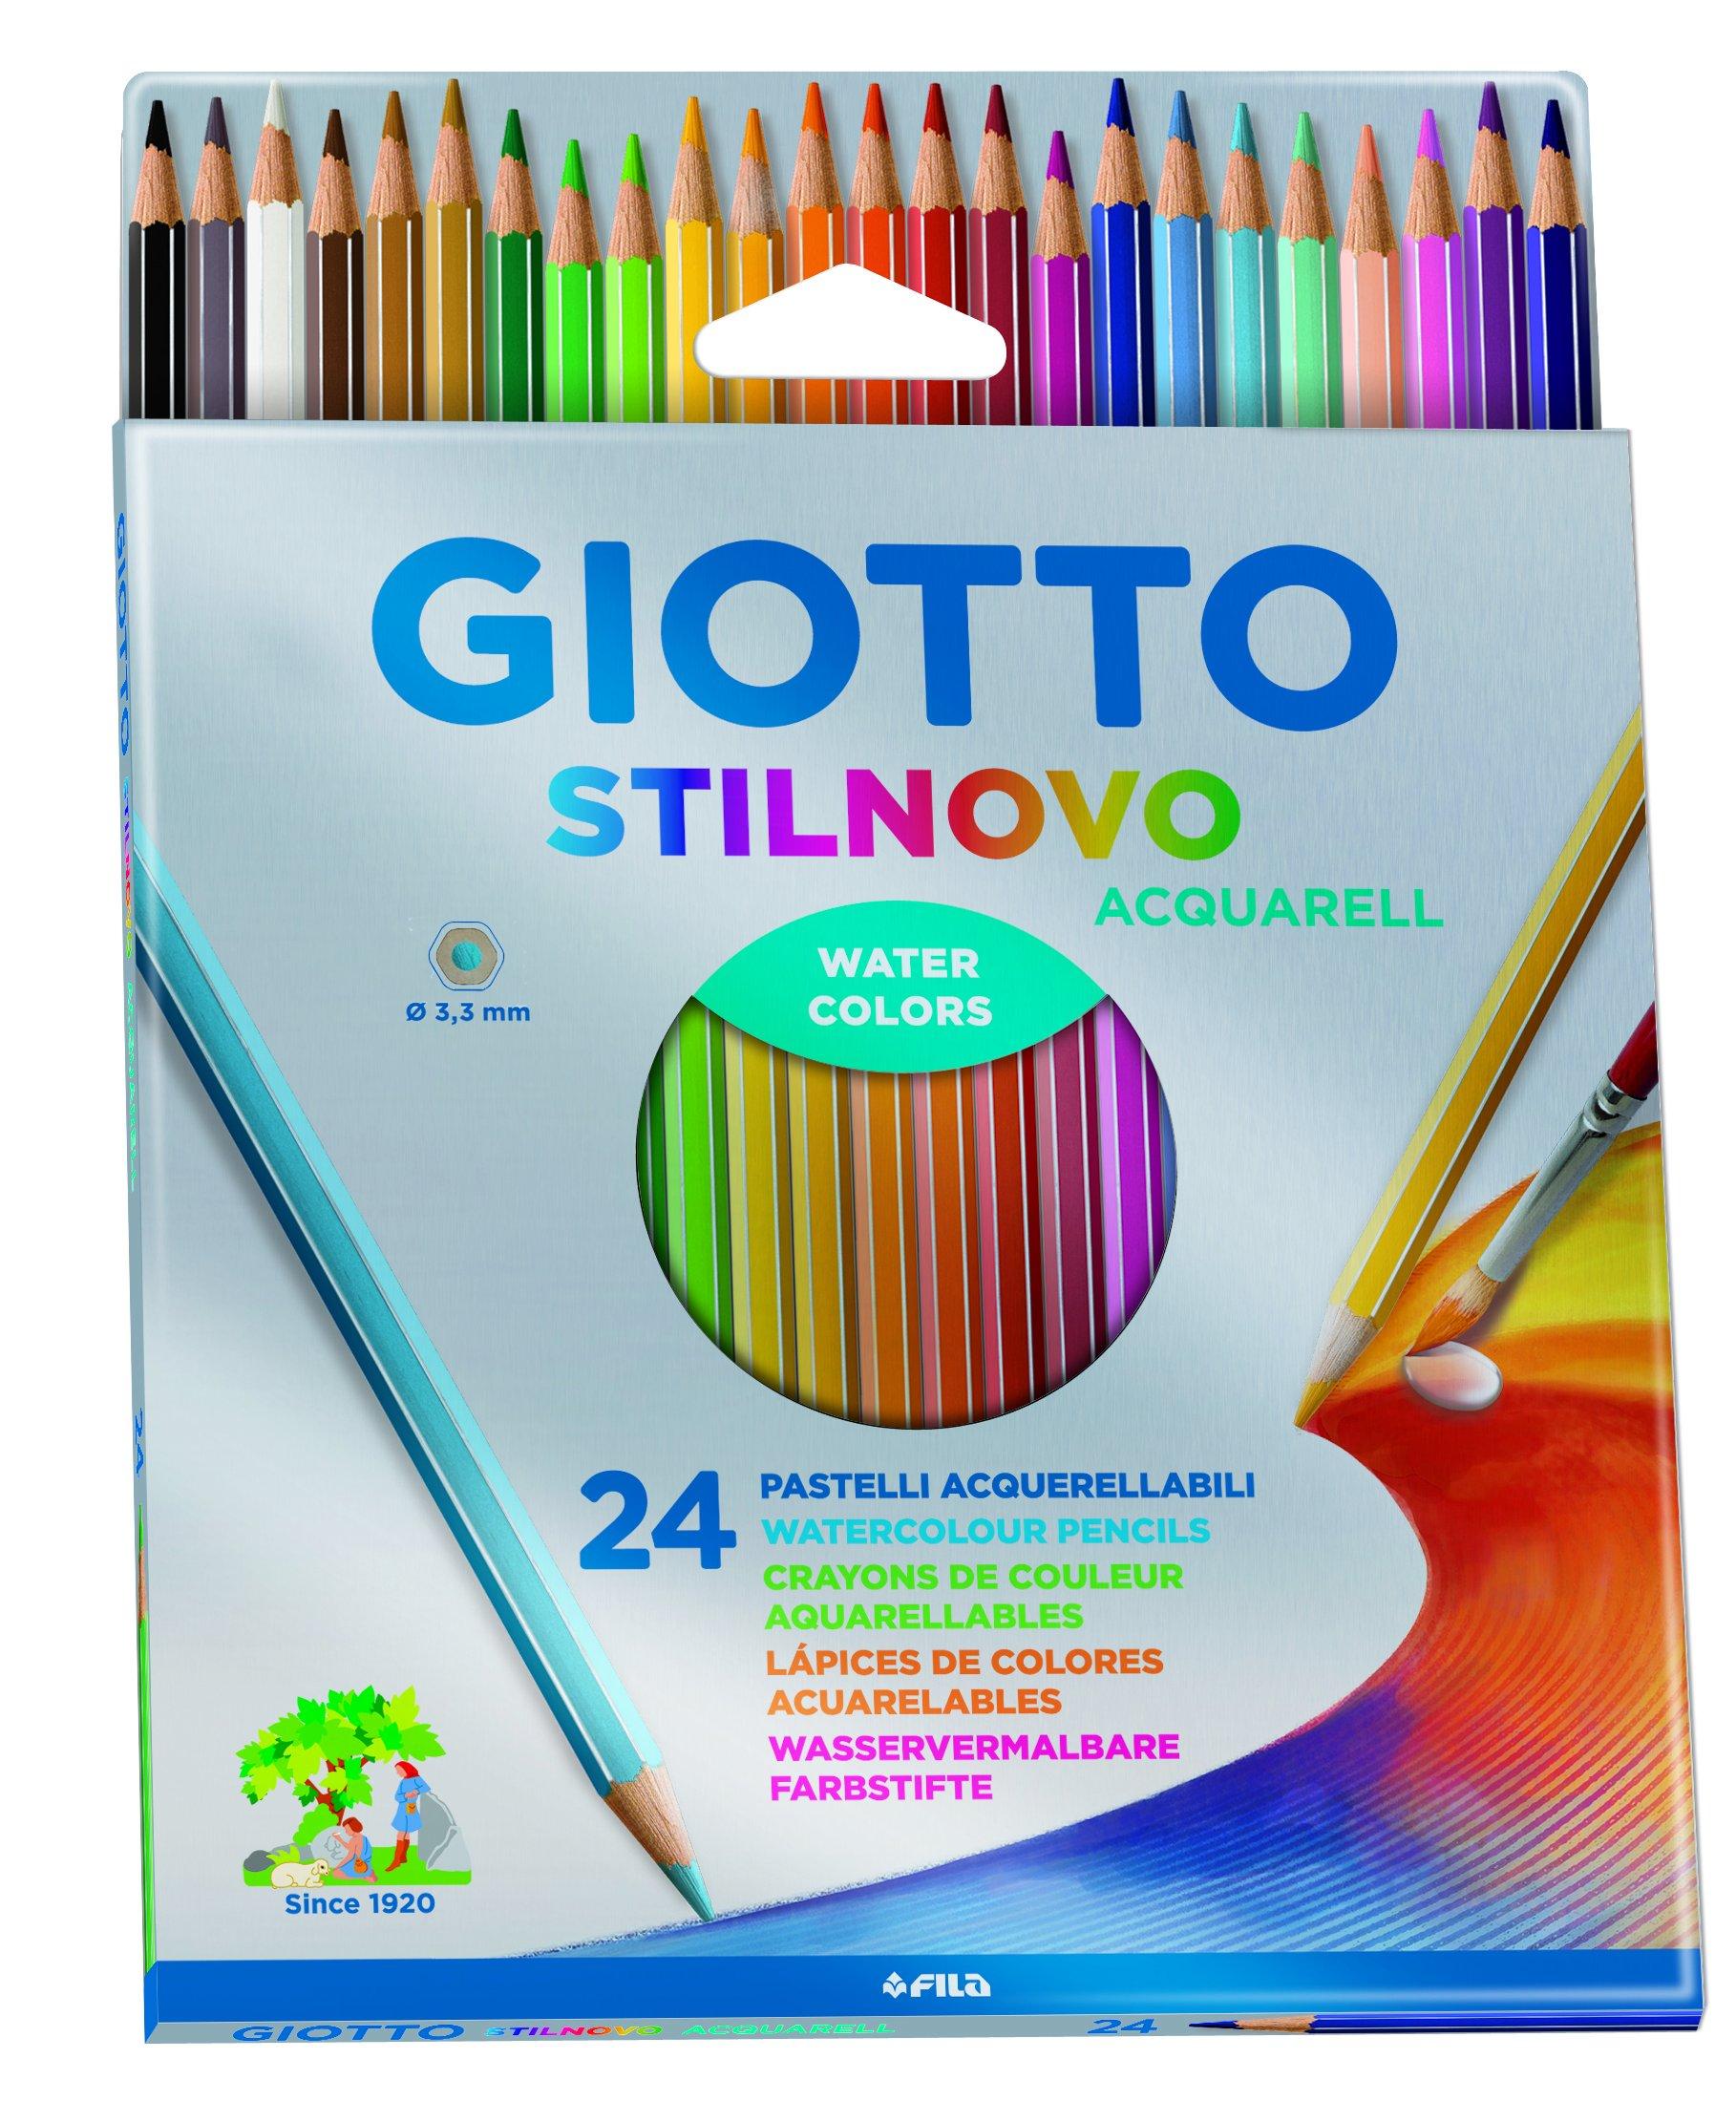 Giotto 255800 Pastelli Acquerellabili Stilnovo, 3.3 mm, Confezione da 24 1 spesavip